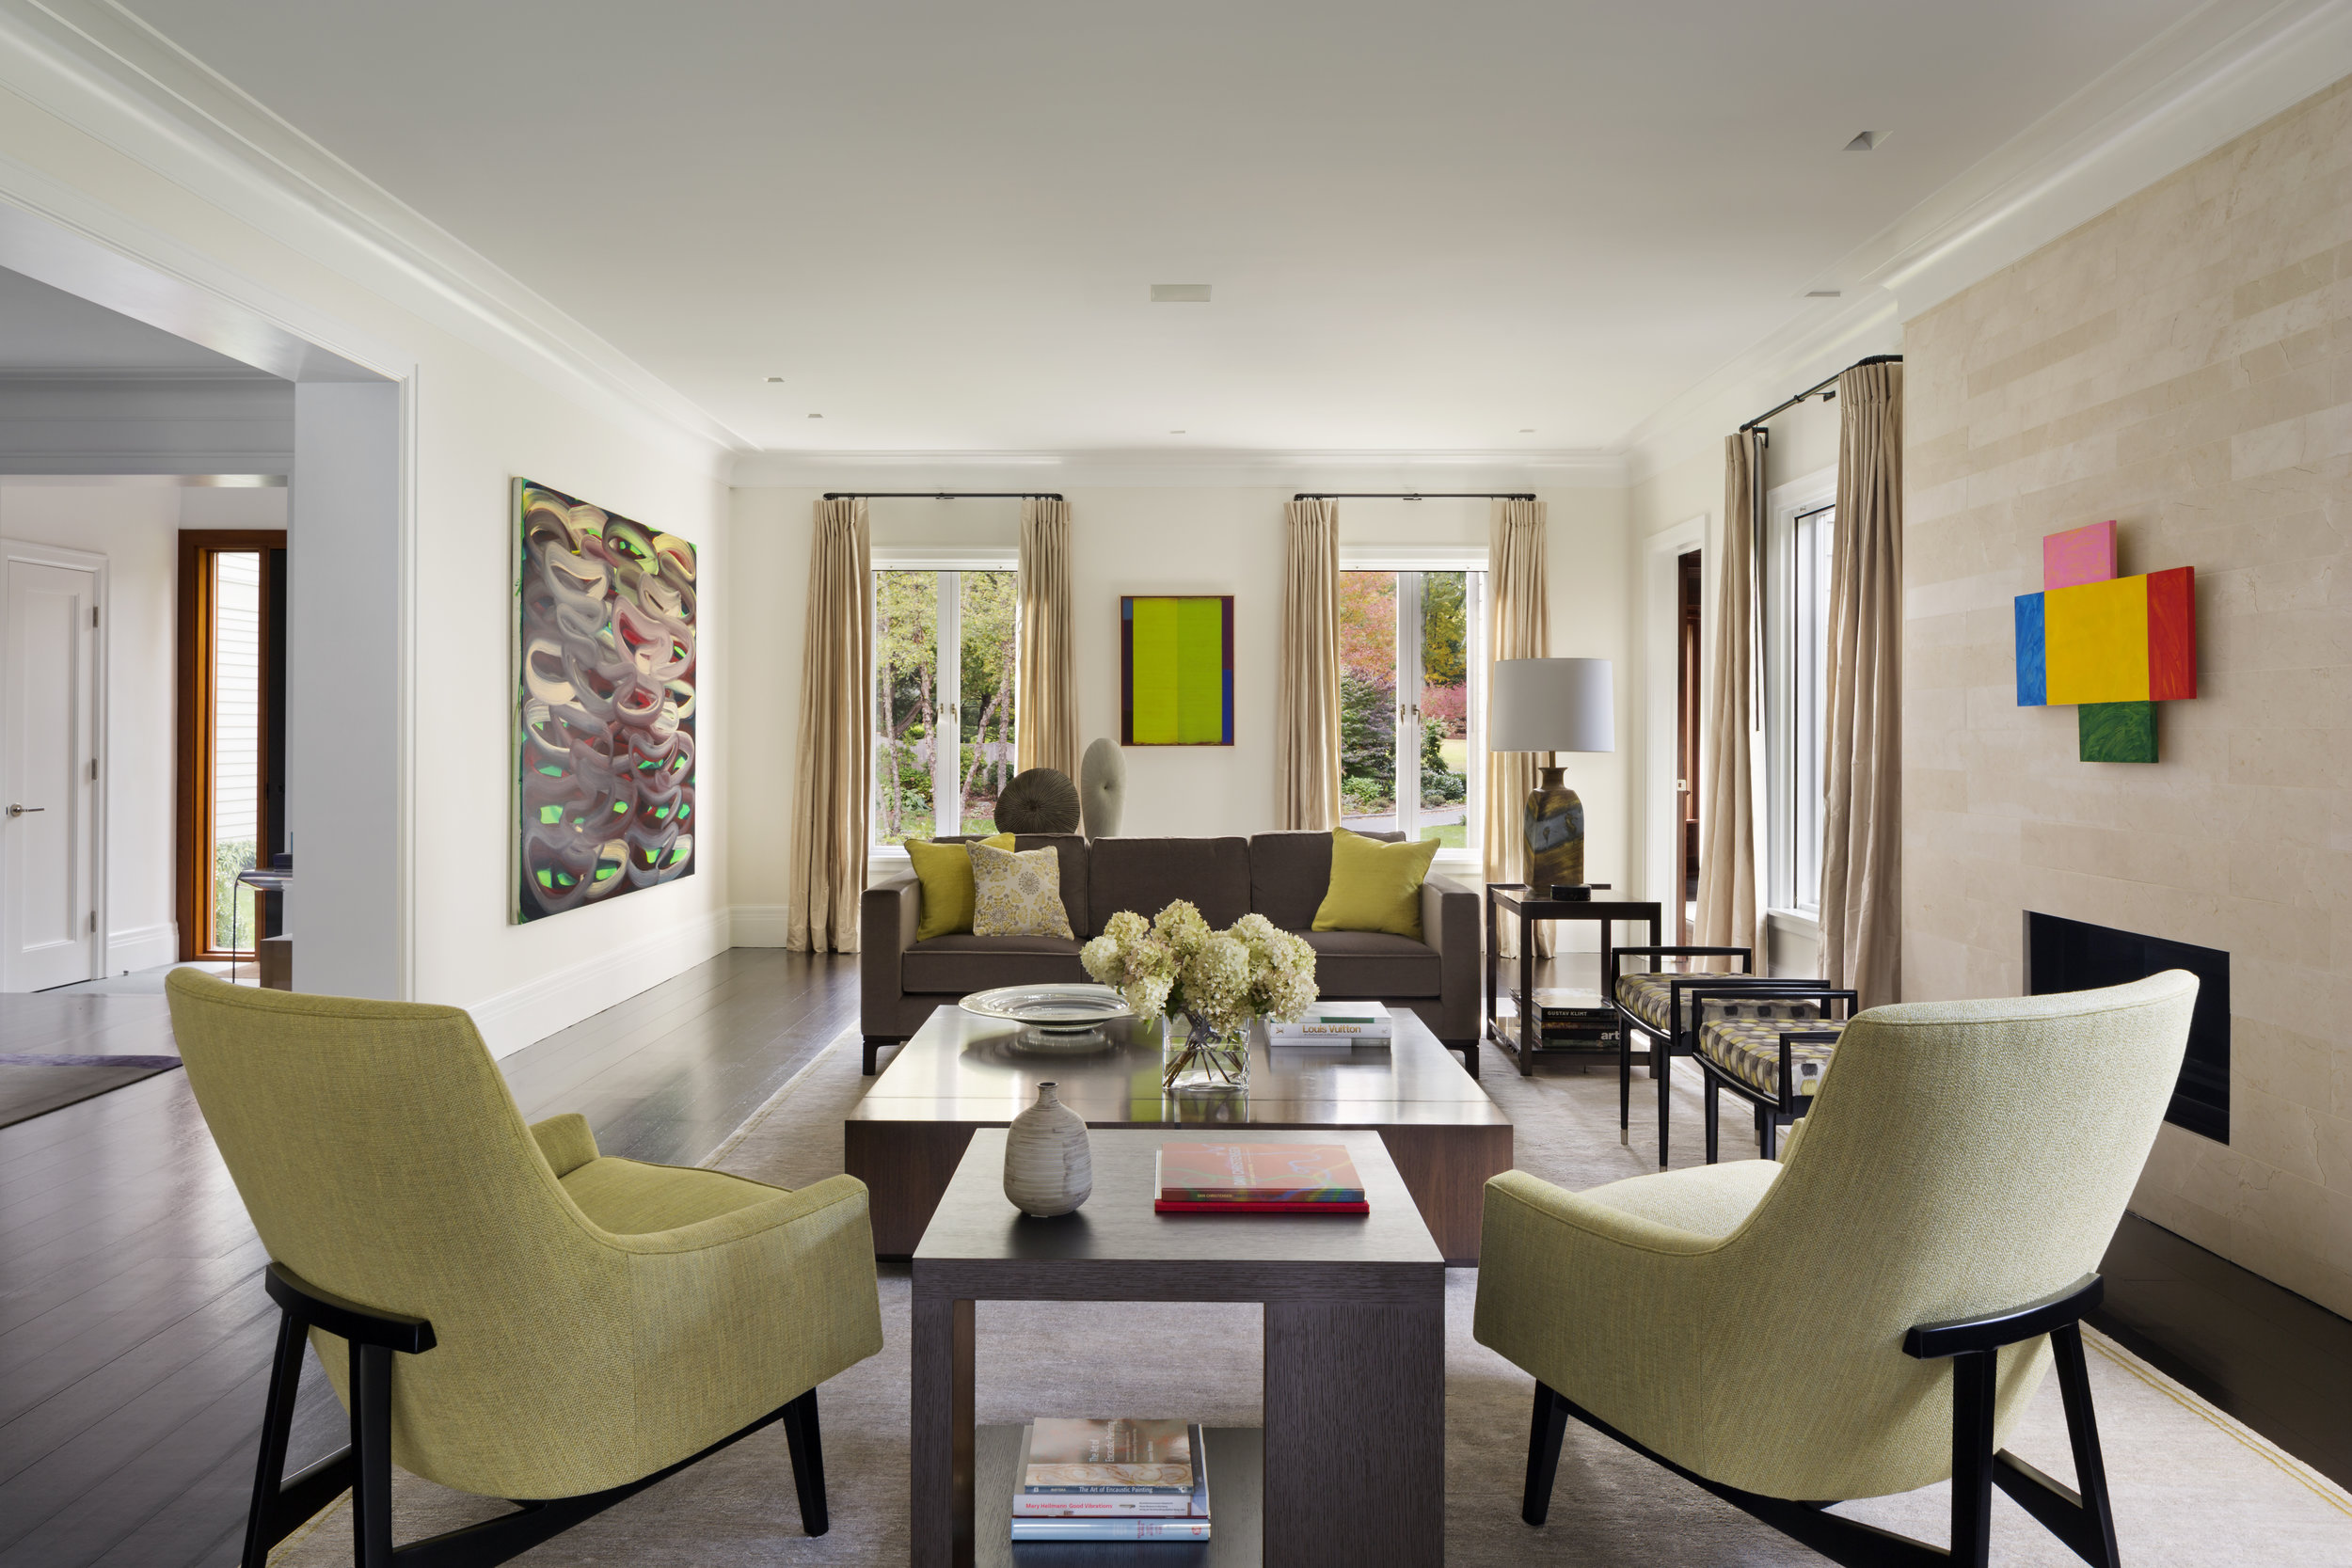 luxe interiors + design - Modern Intervention, Summer 2015